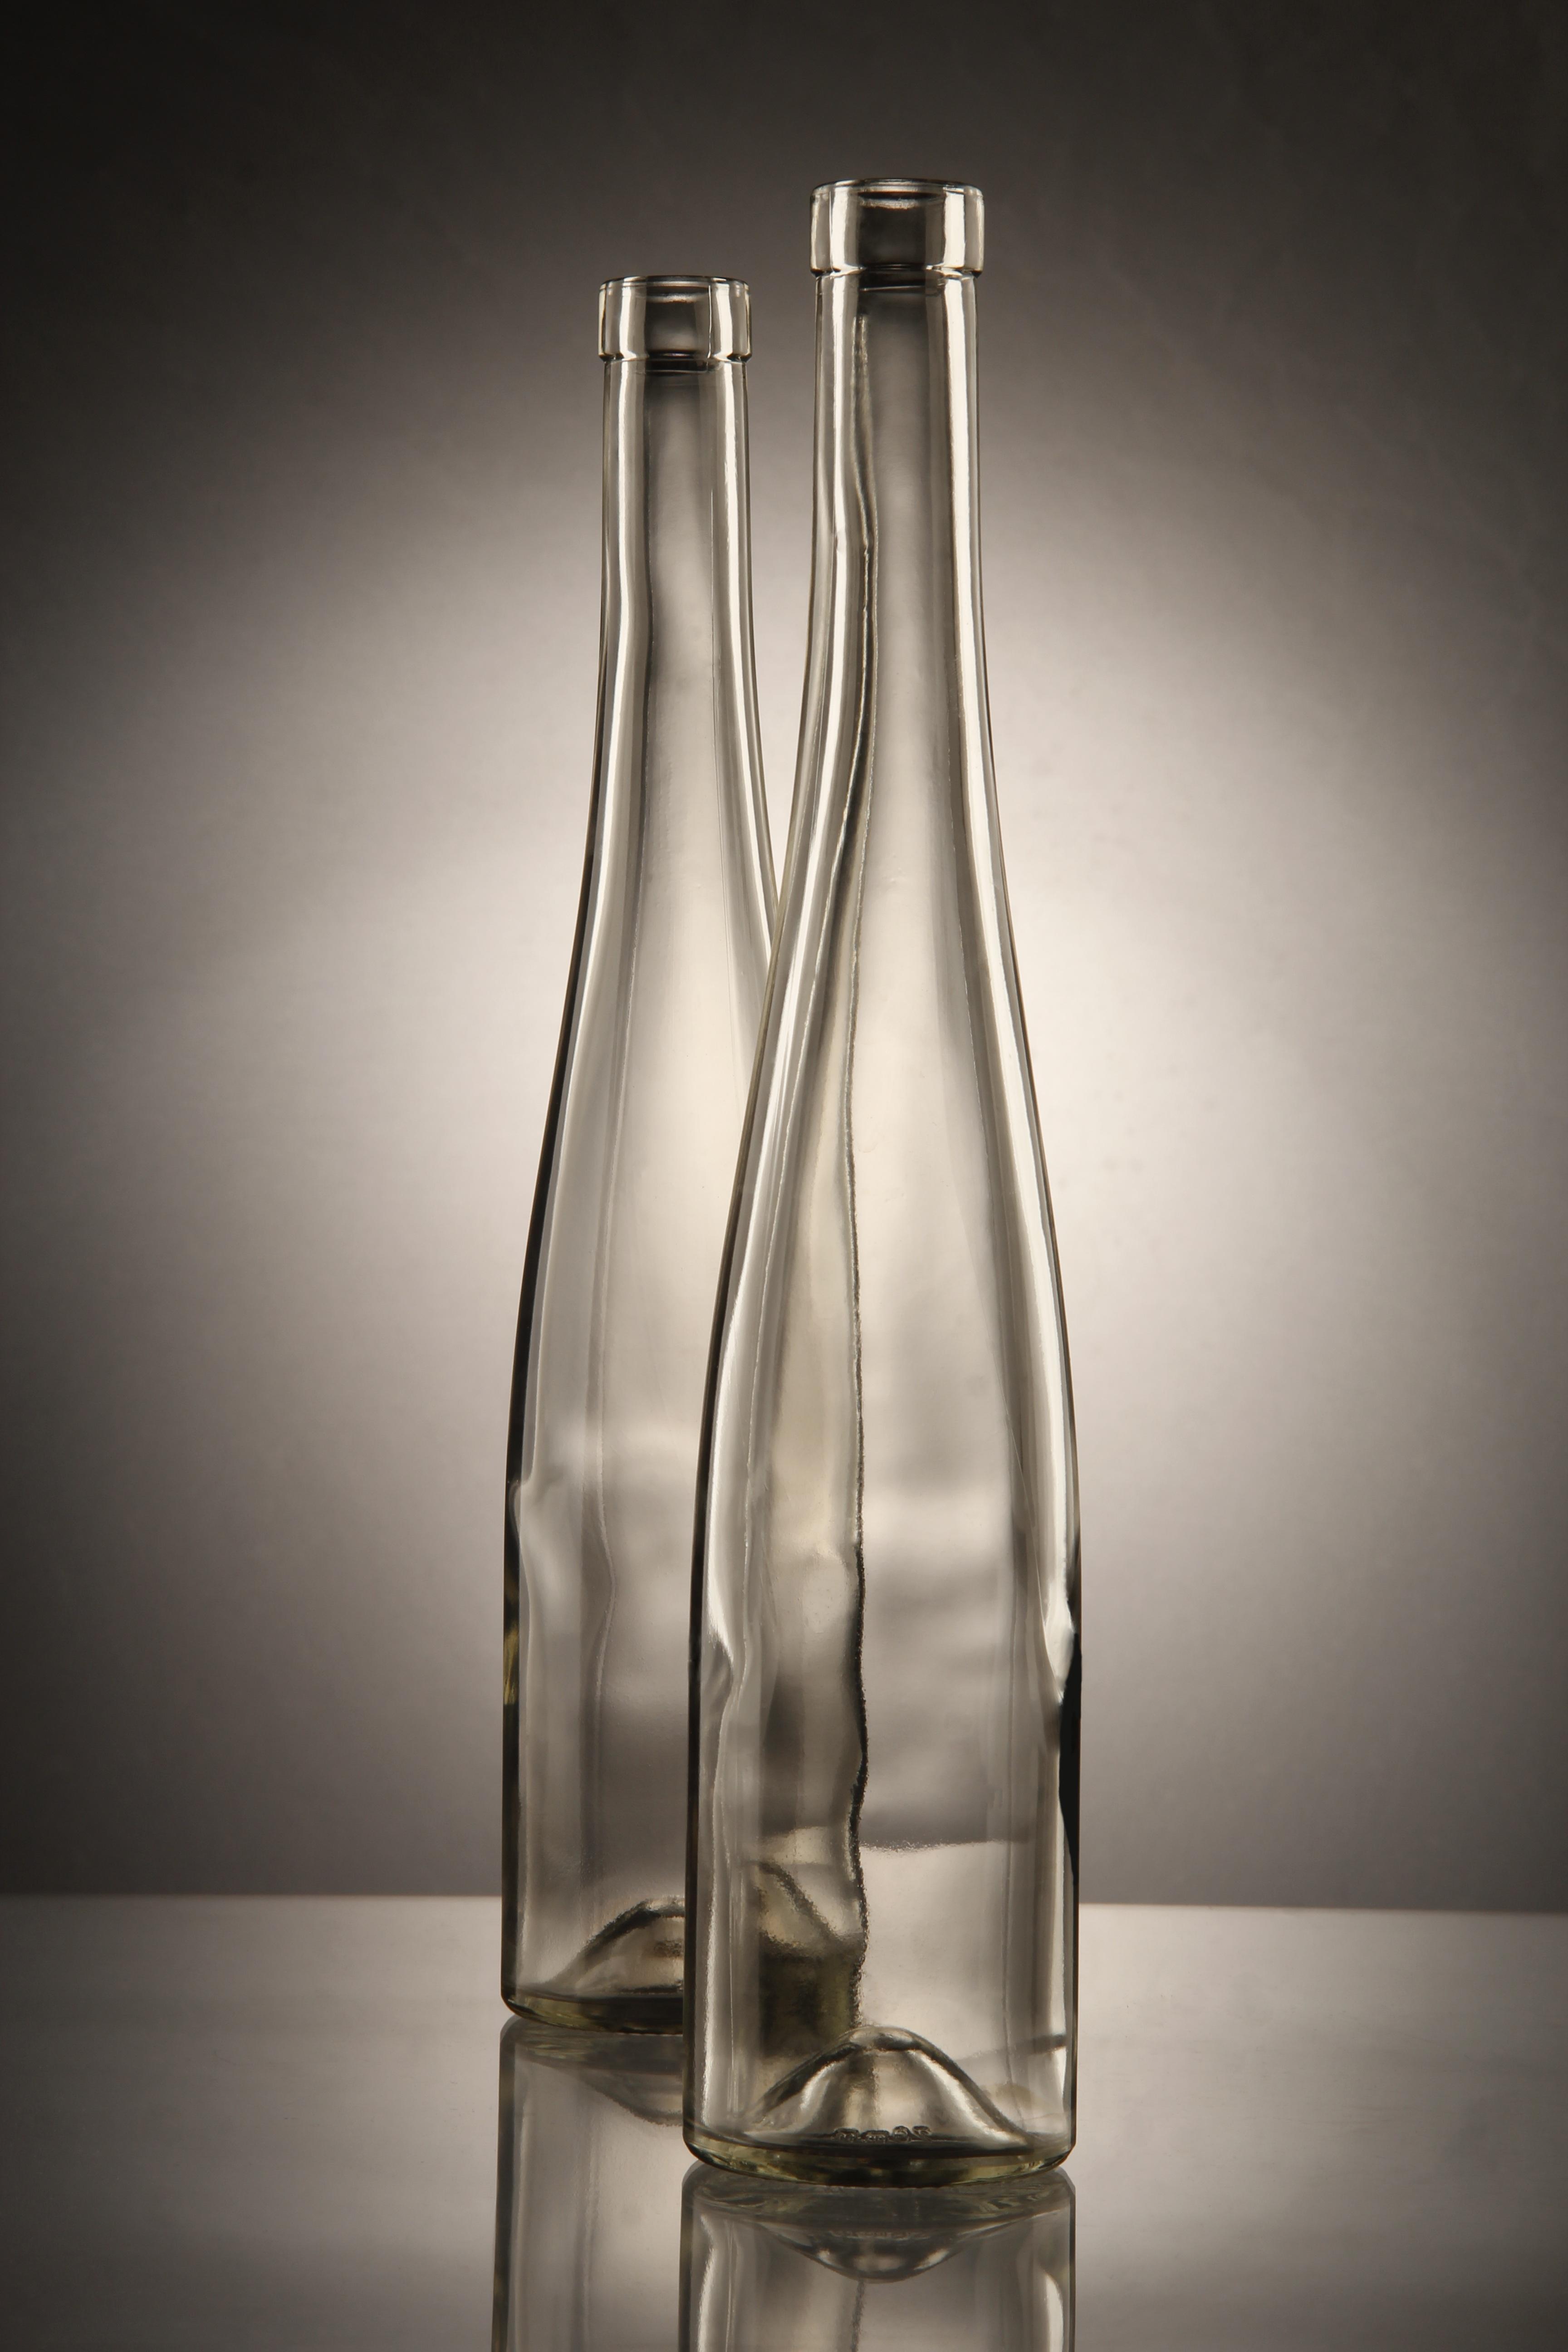 light glass vase line studio bottle tableware wine bottle glass bottle curves composition beer bottle ch&agne & Free Images : vase line studio tableware wine bottle glass ...